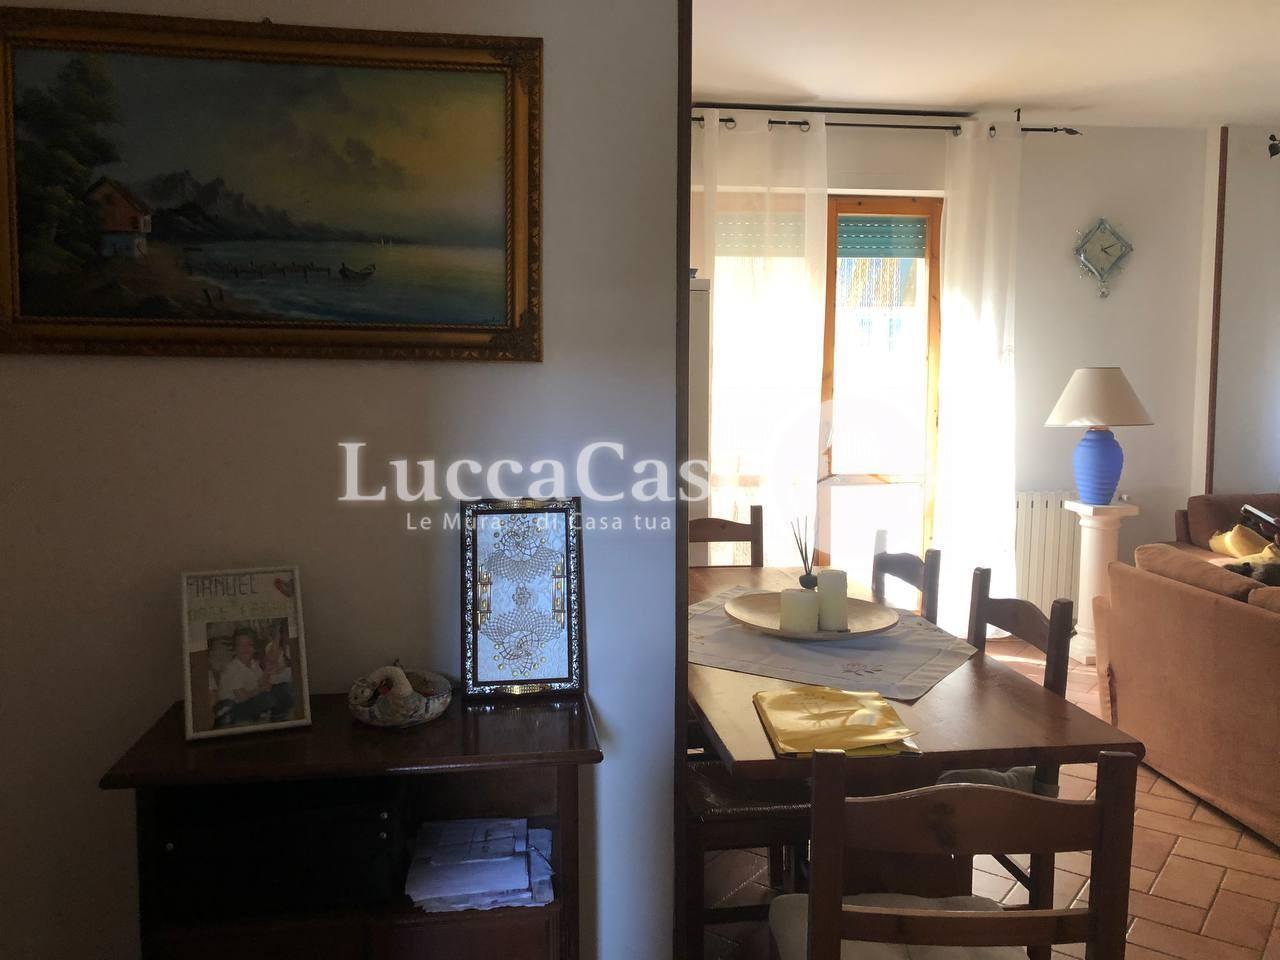 Appartamento in vendita a Porcari (LU)